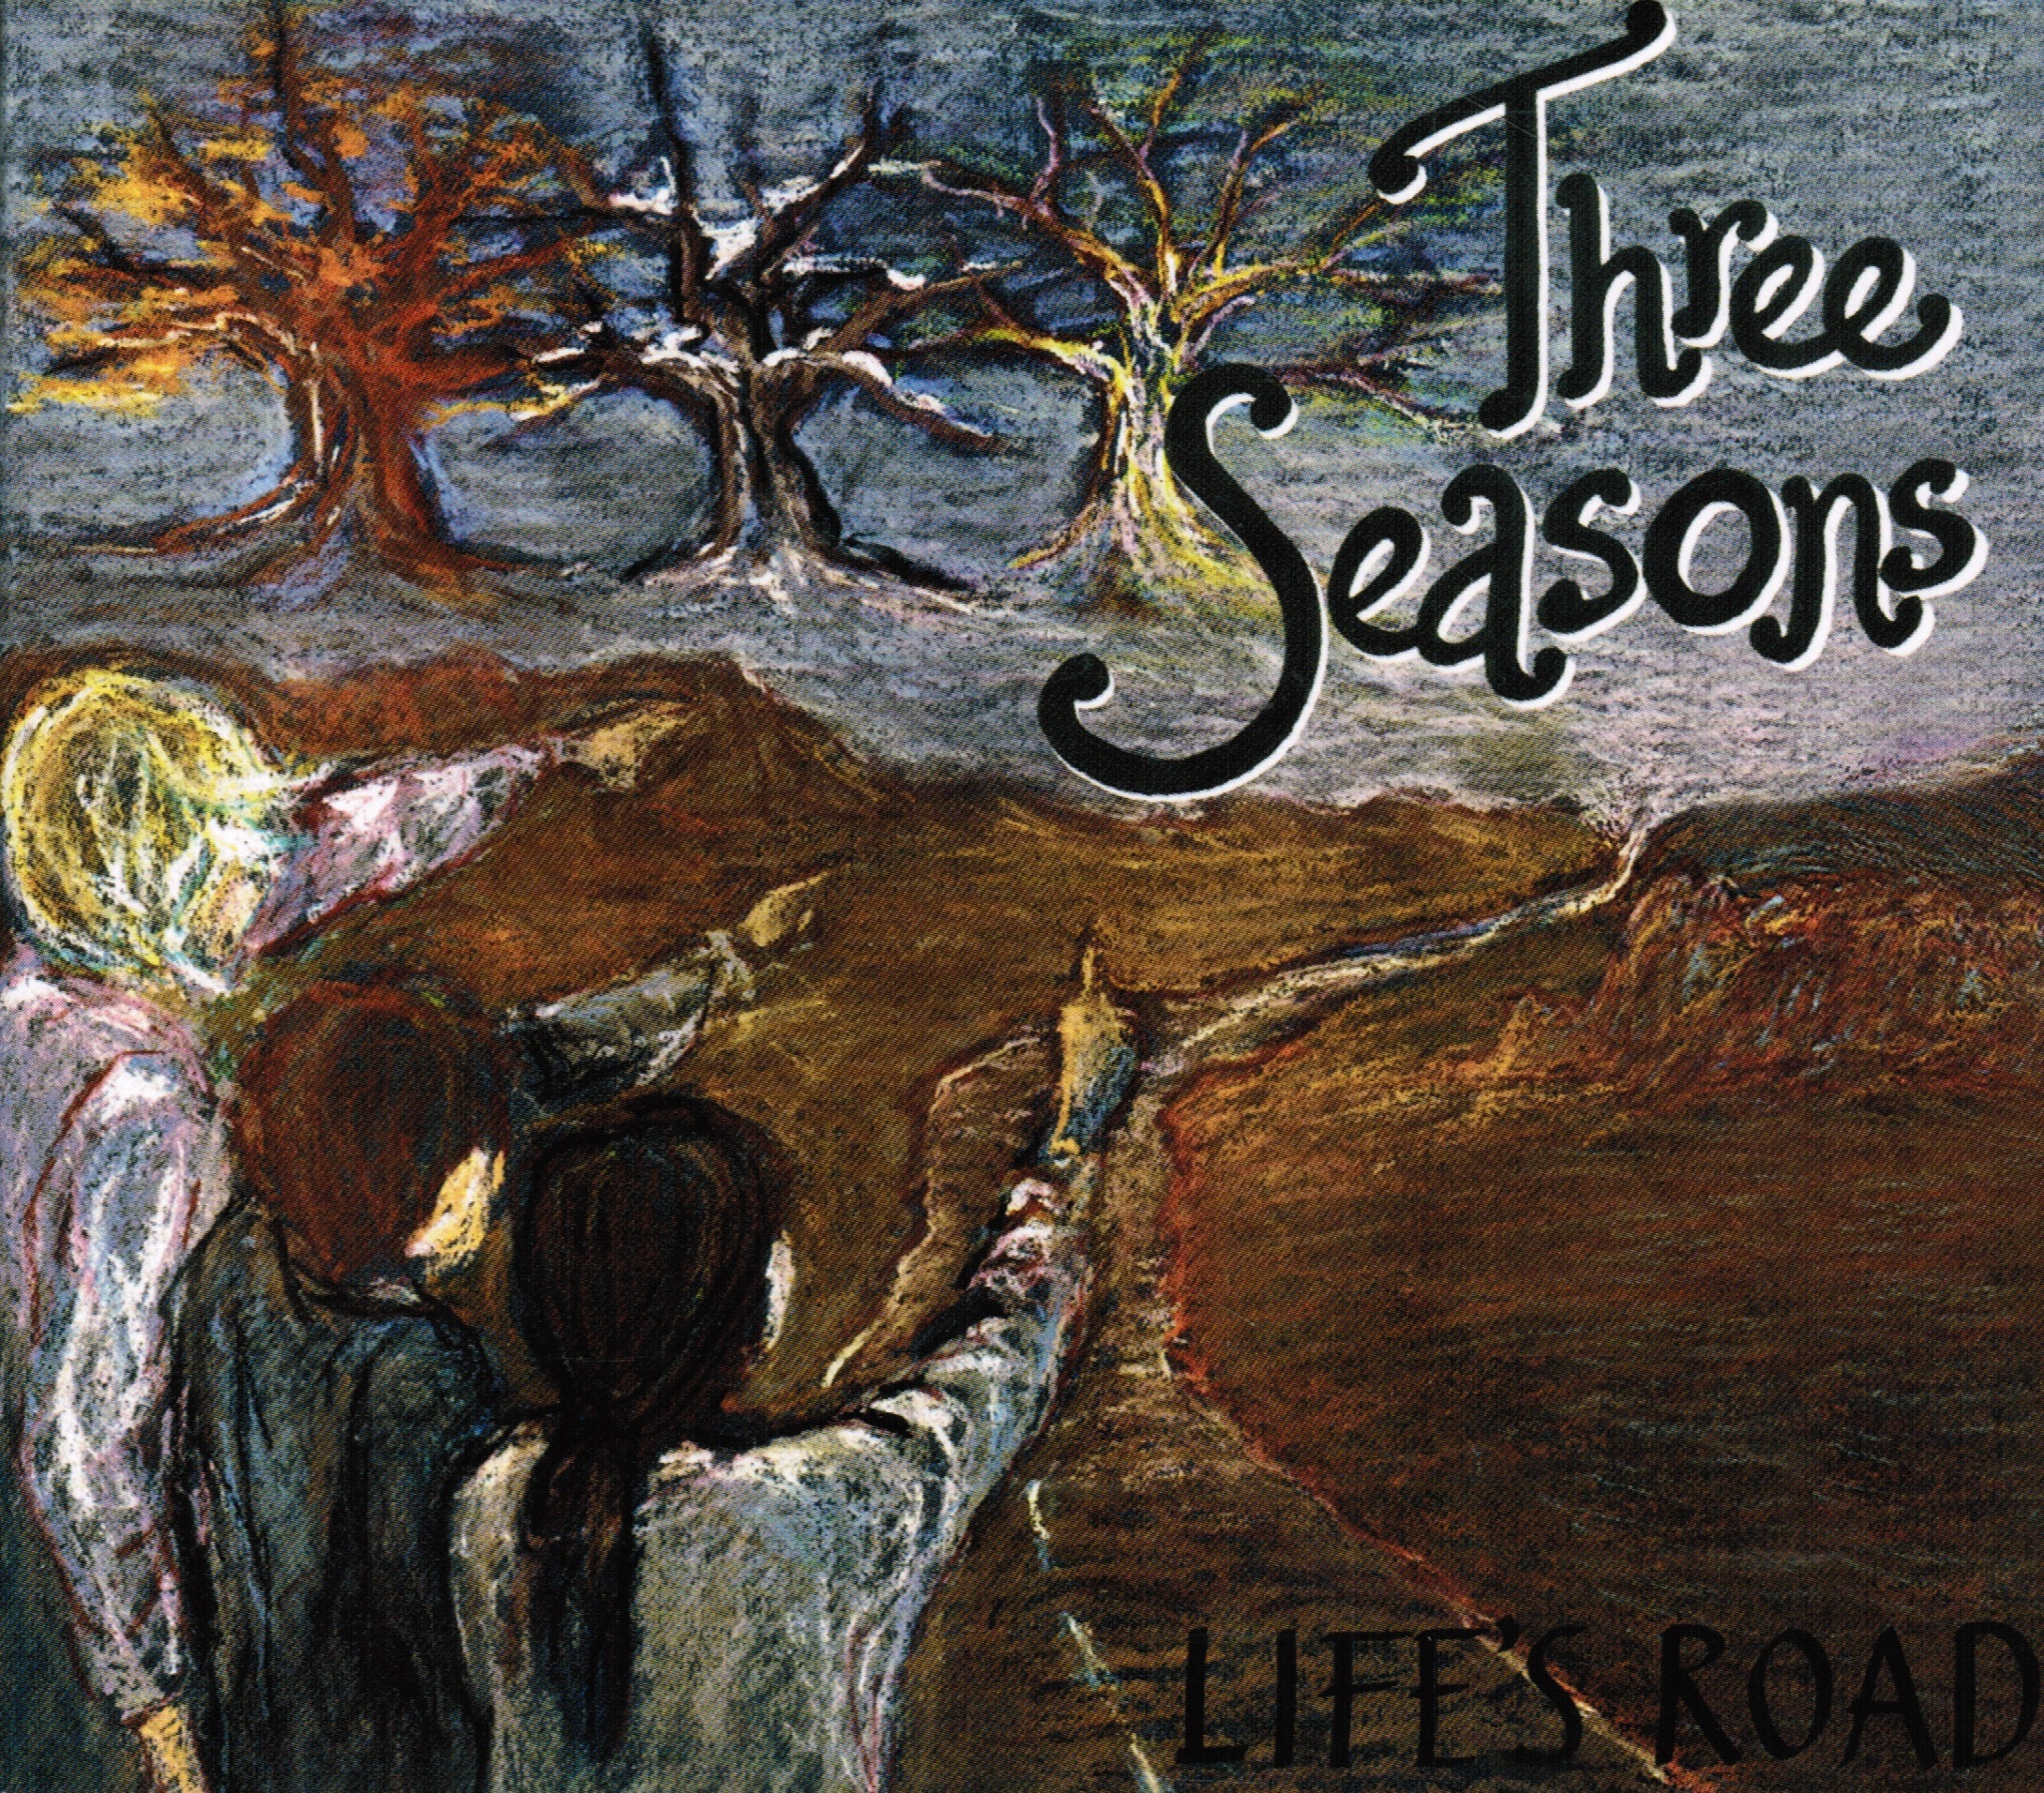 THREE SEASONS (Sue) – Life's Road, 2011